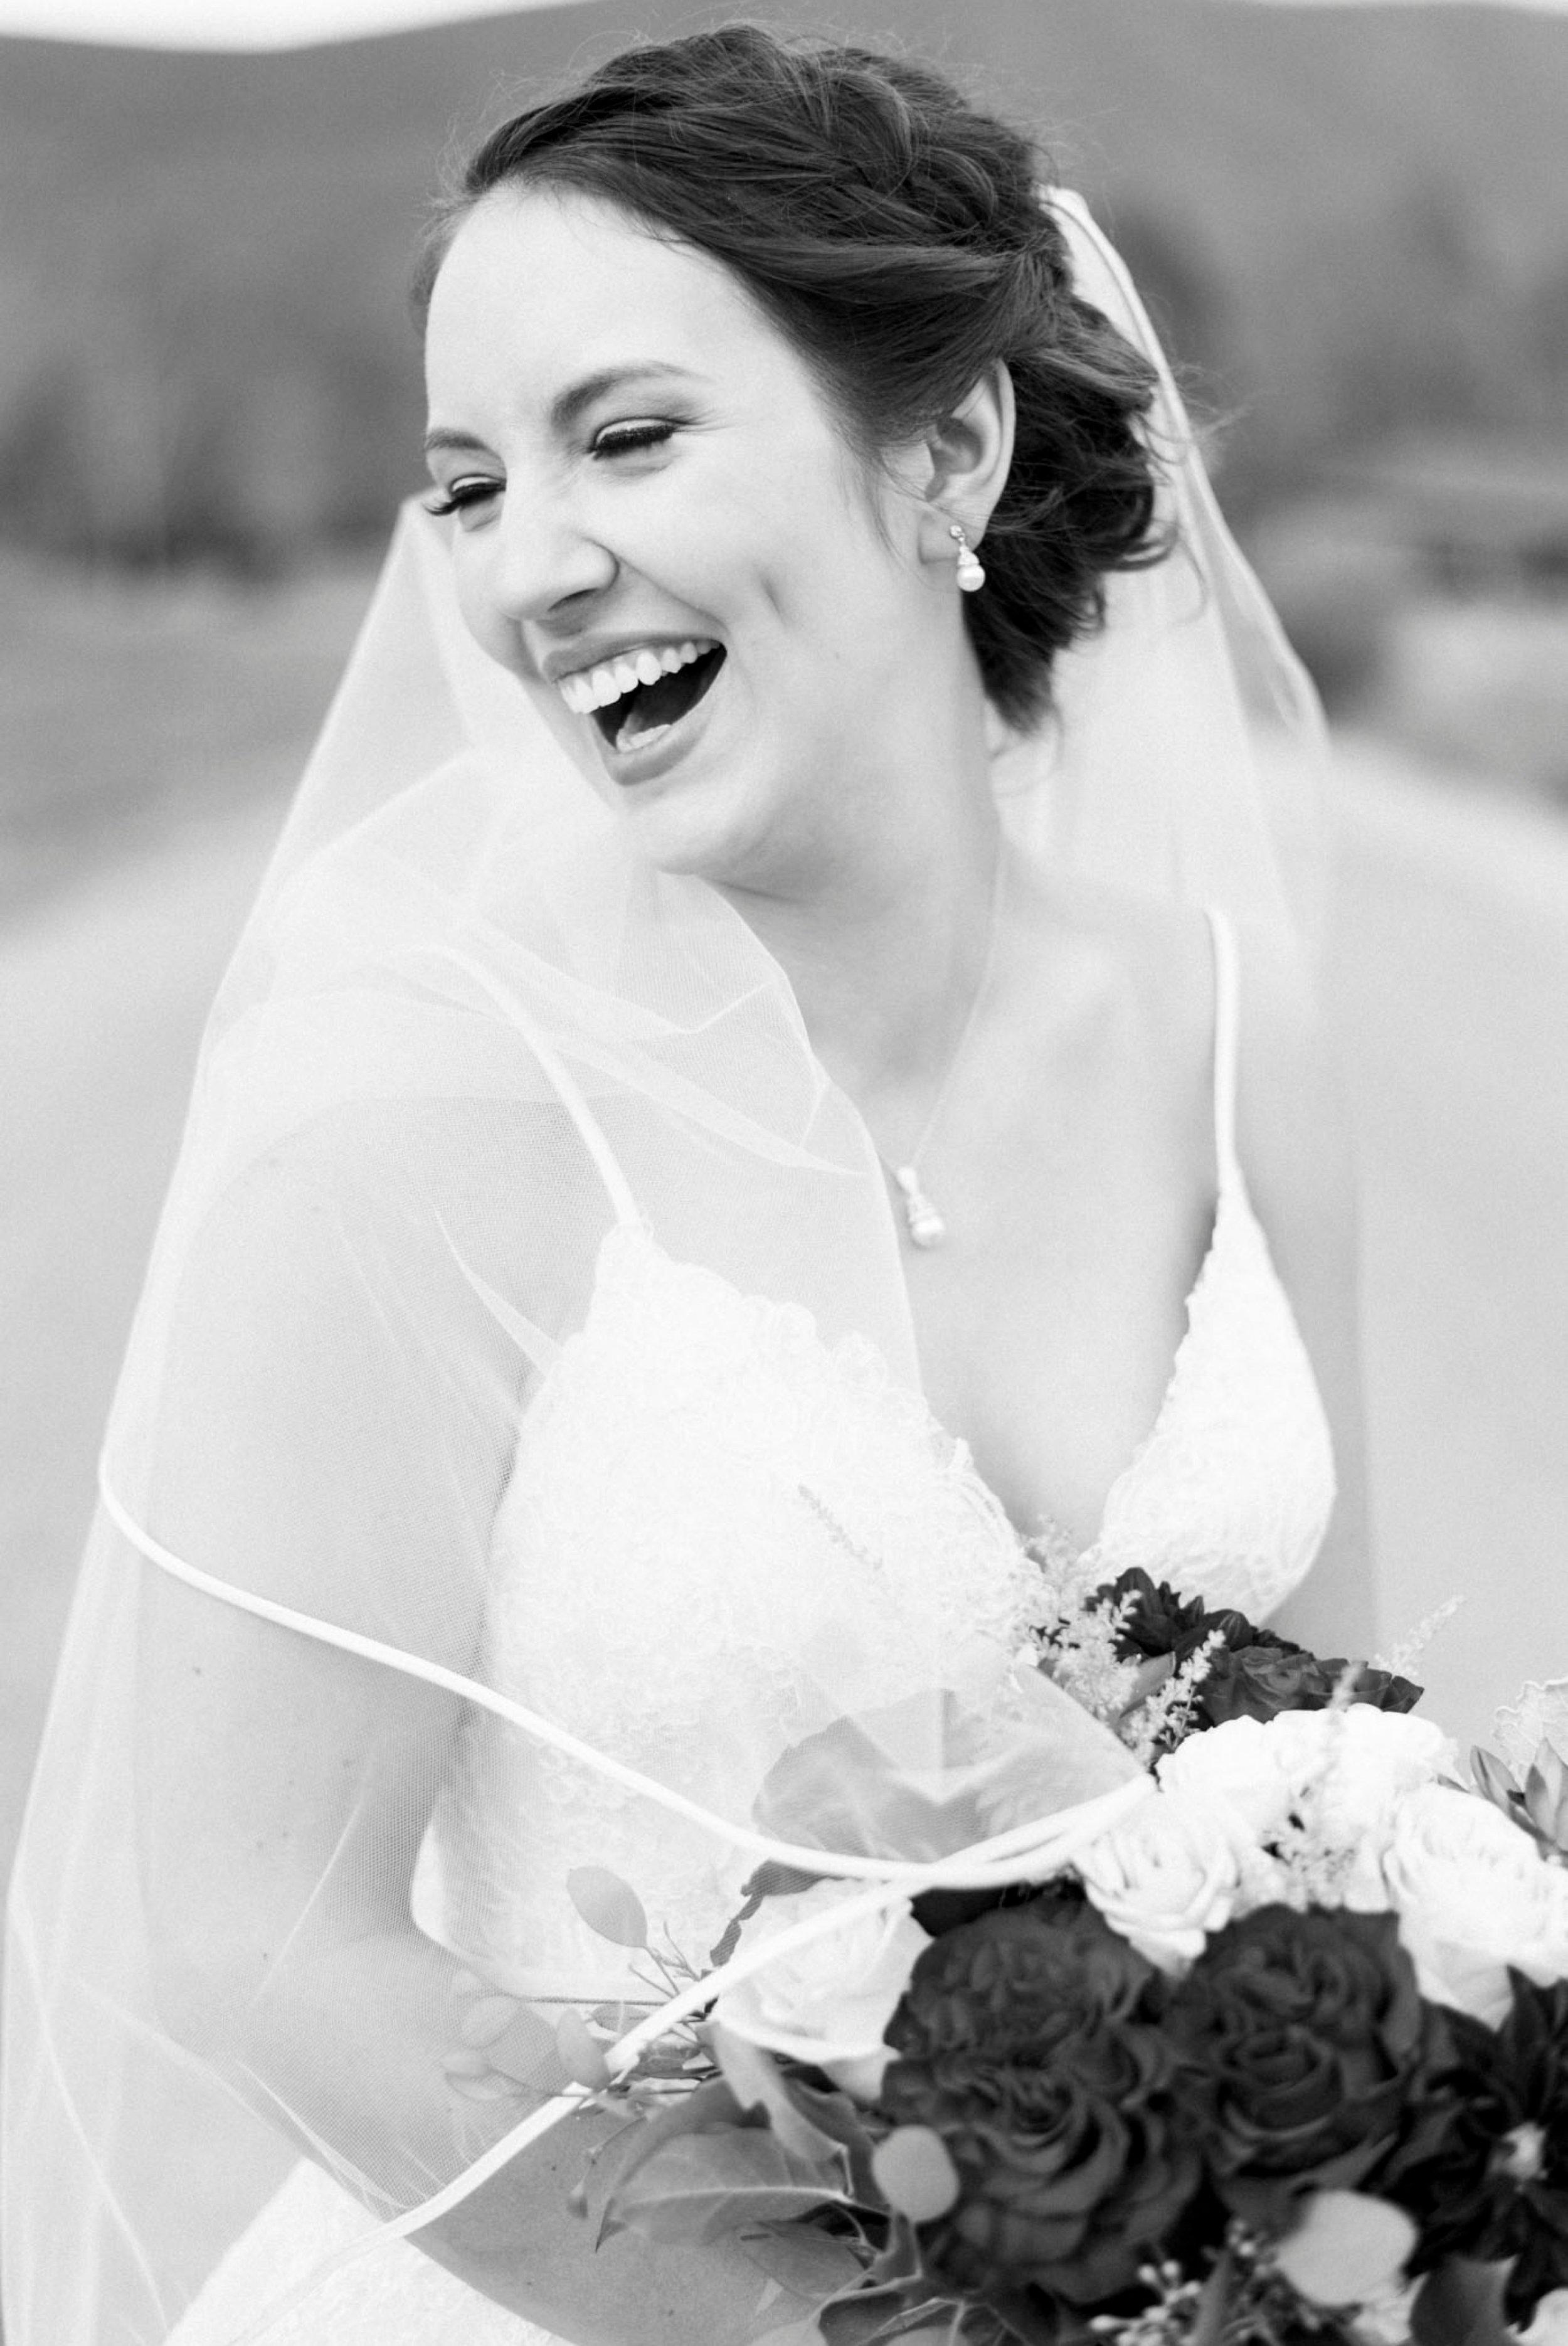 IrvineEstate_LexingtonVA_Wedding_FallWedding_VirginiaWeddingPhotographer 48.jpg